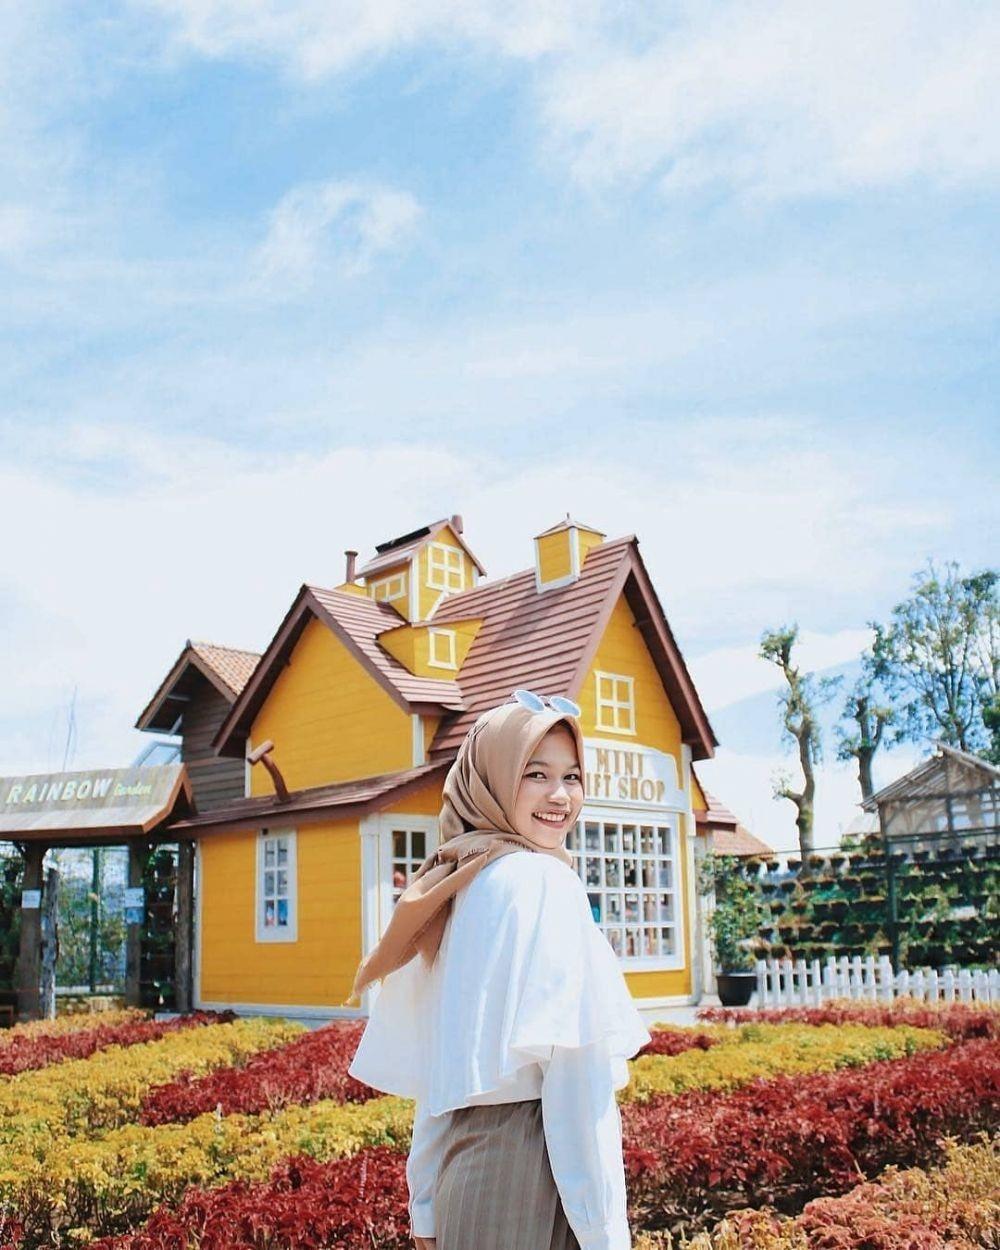 10 Spot Foto Unik di Bandung yang Paling Hits dan Instagramable